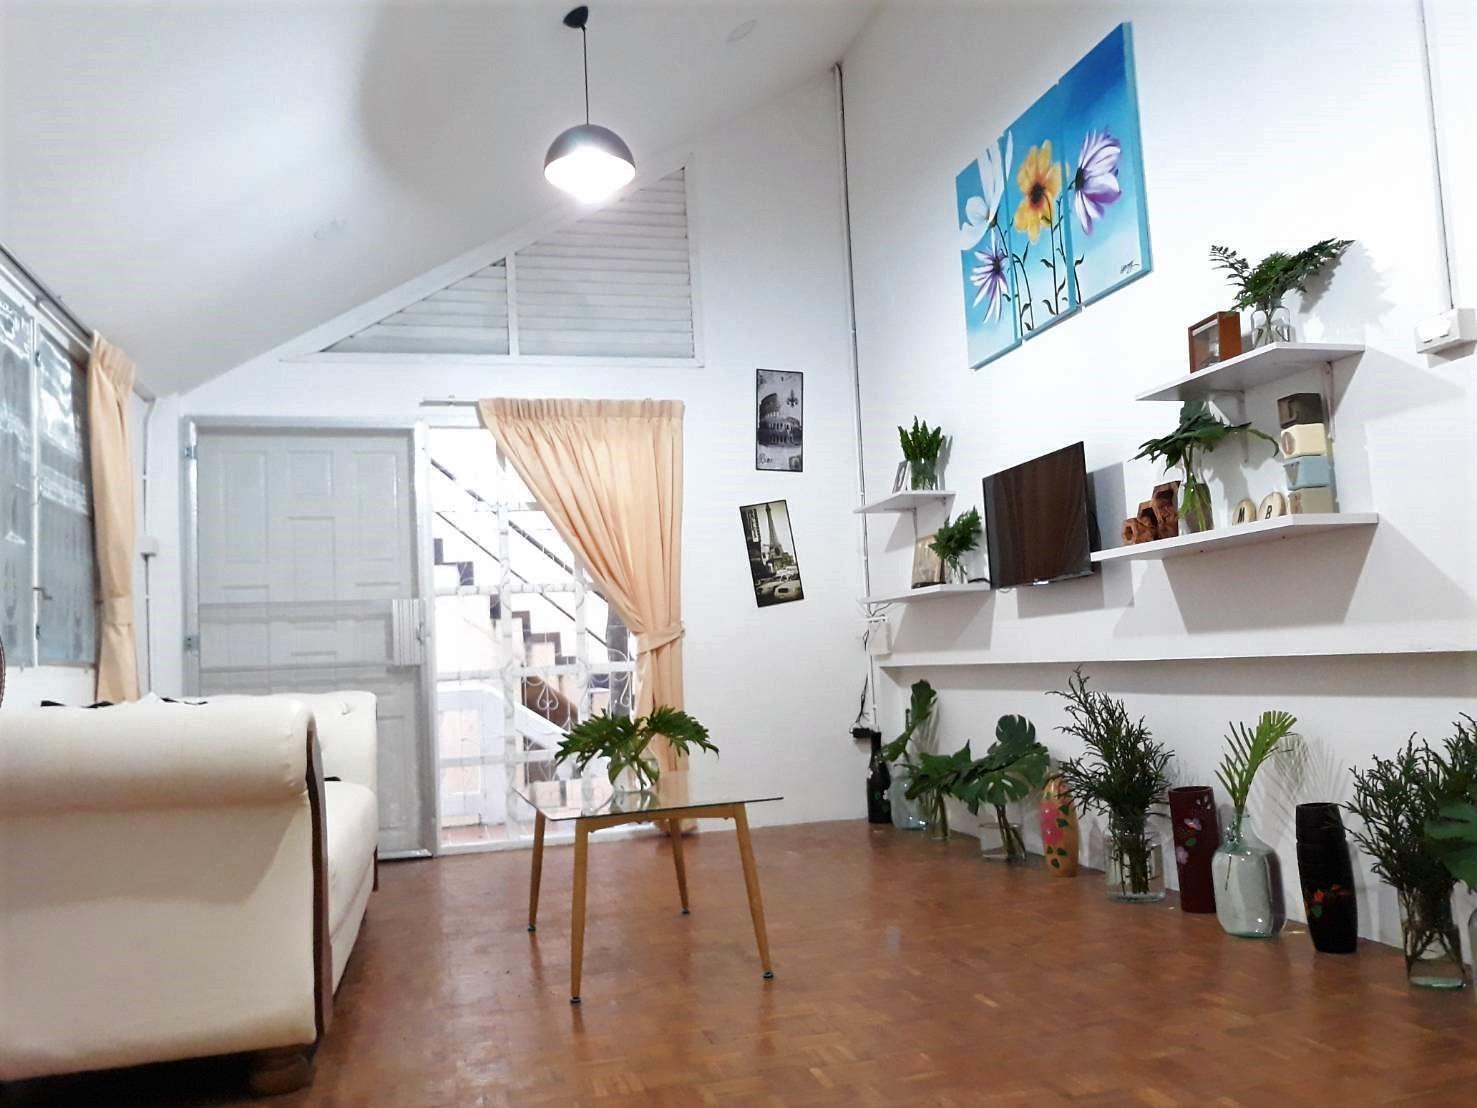 Perfect Home Chiang Mai, Lino House   Inc shuttles Perfect Home Chiang Mai, Lino House   Inc shuttles